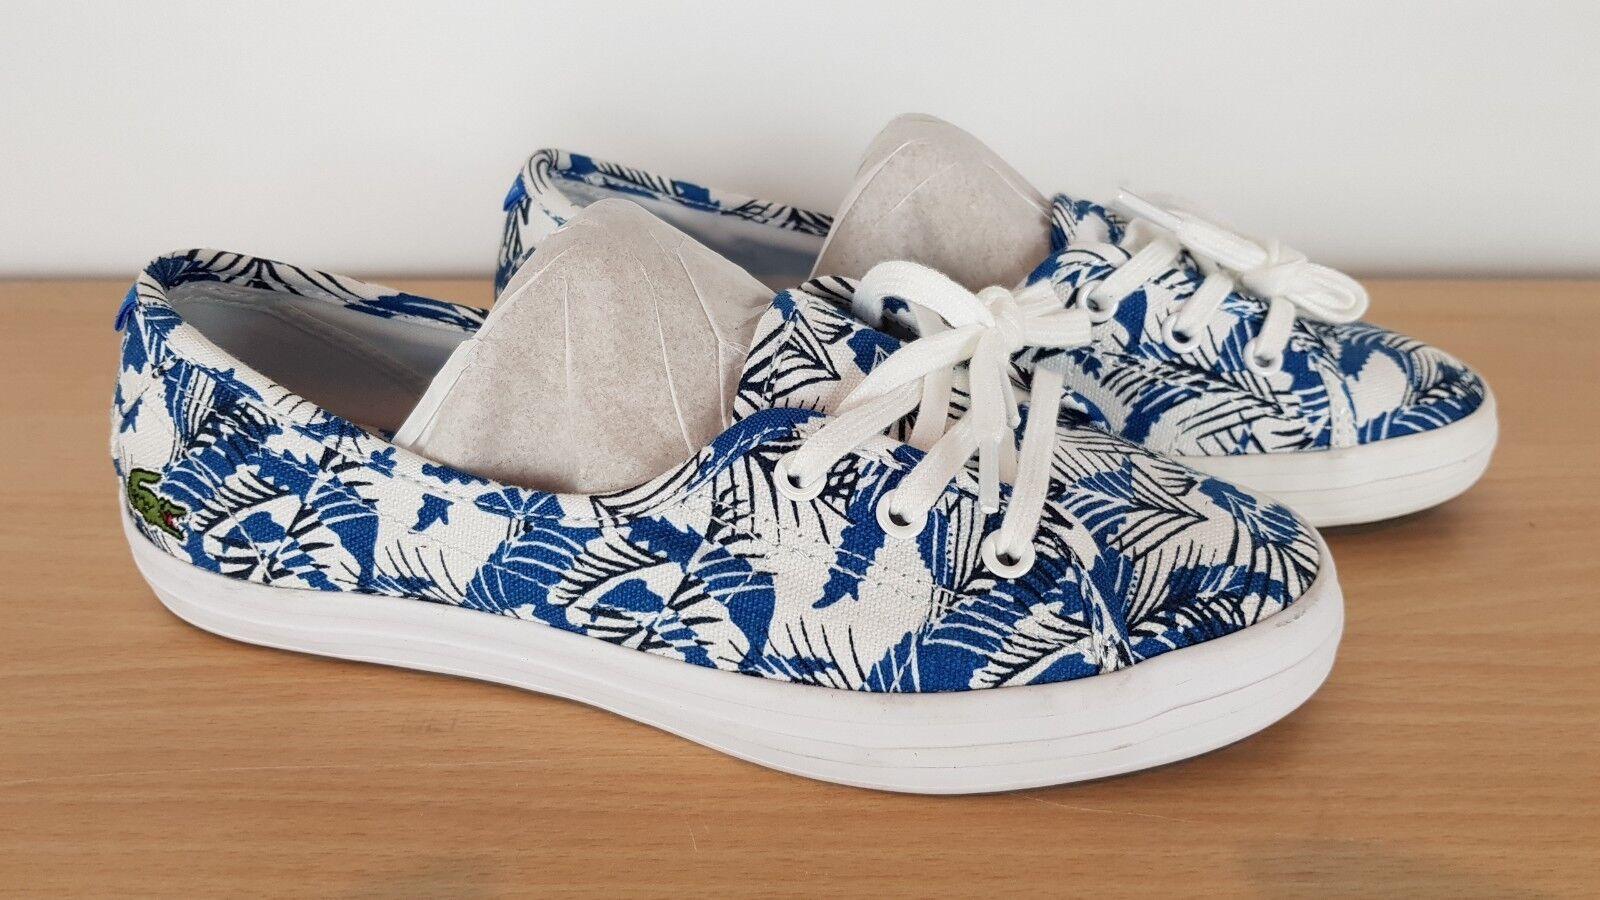 Lacoste Ladies Ziane Chunky Fun bluee Black Canvas Flats Pumps shoes, UK 4 EU 37